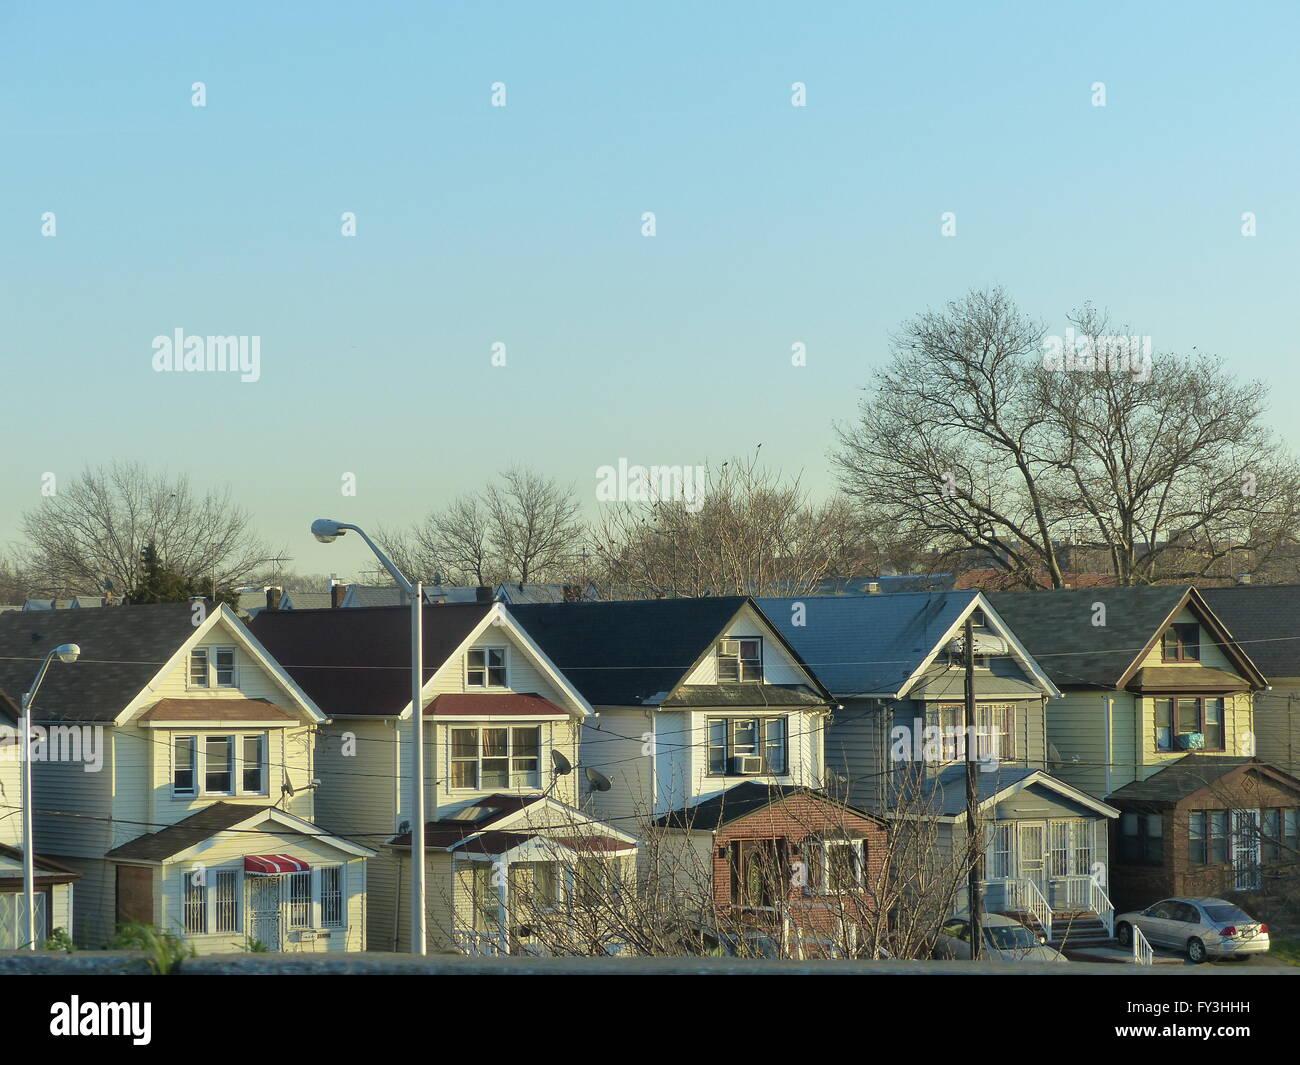 New York City, Queens, row of look alike houses - Stock Image